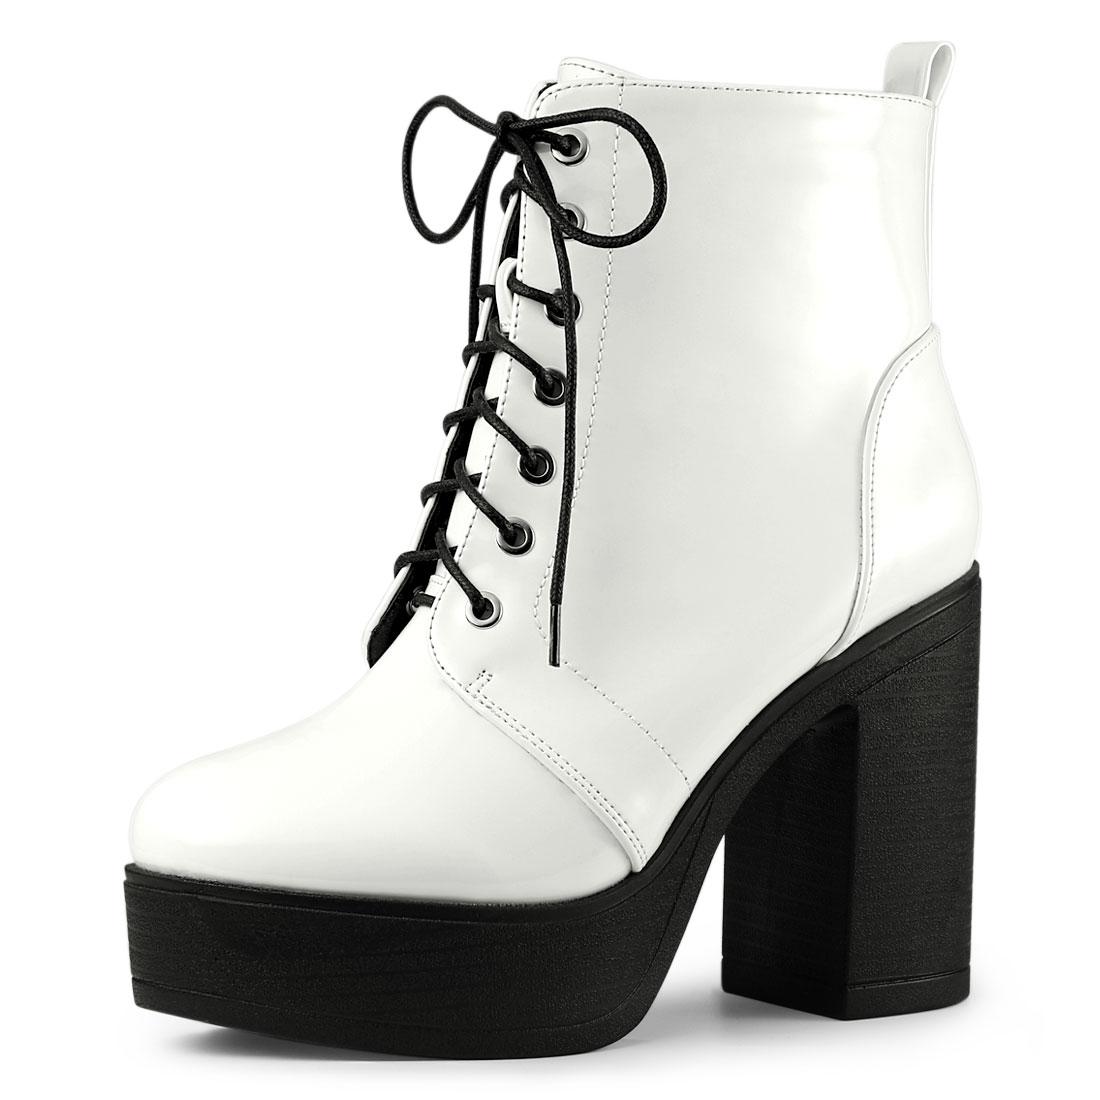 Allegra K Women's Platform Chunky High Heel Lace Up Combat Boots White US 6